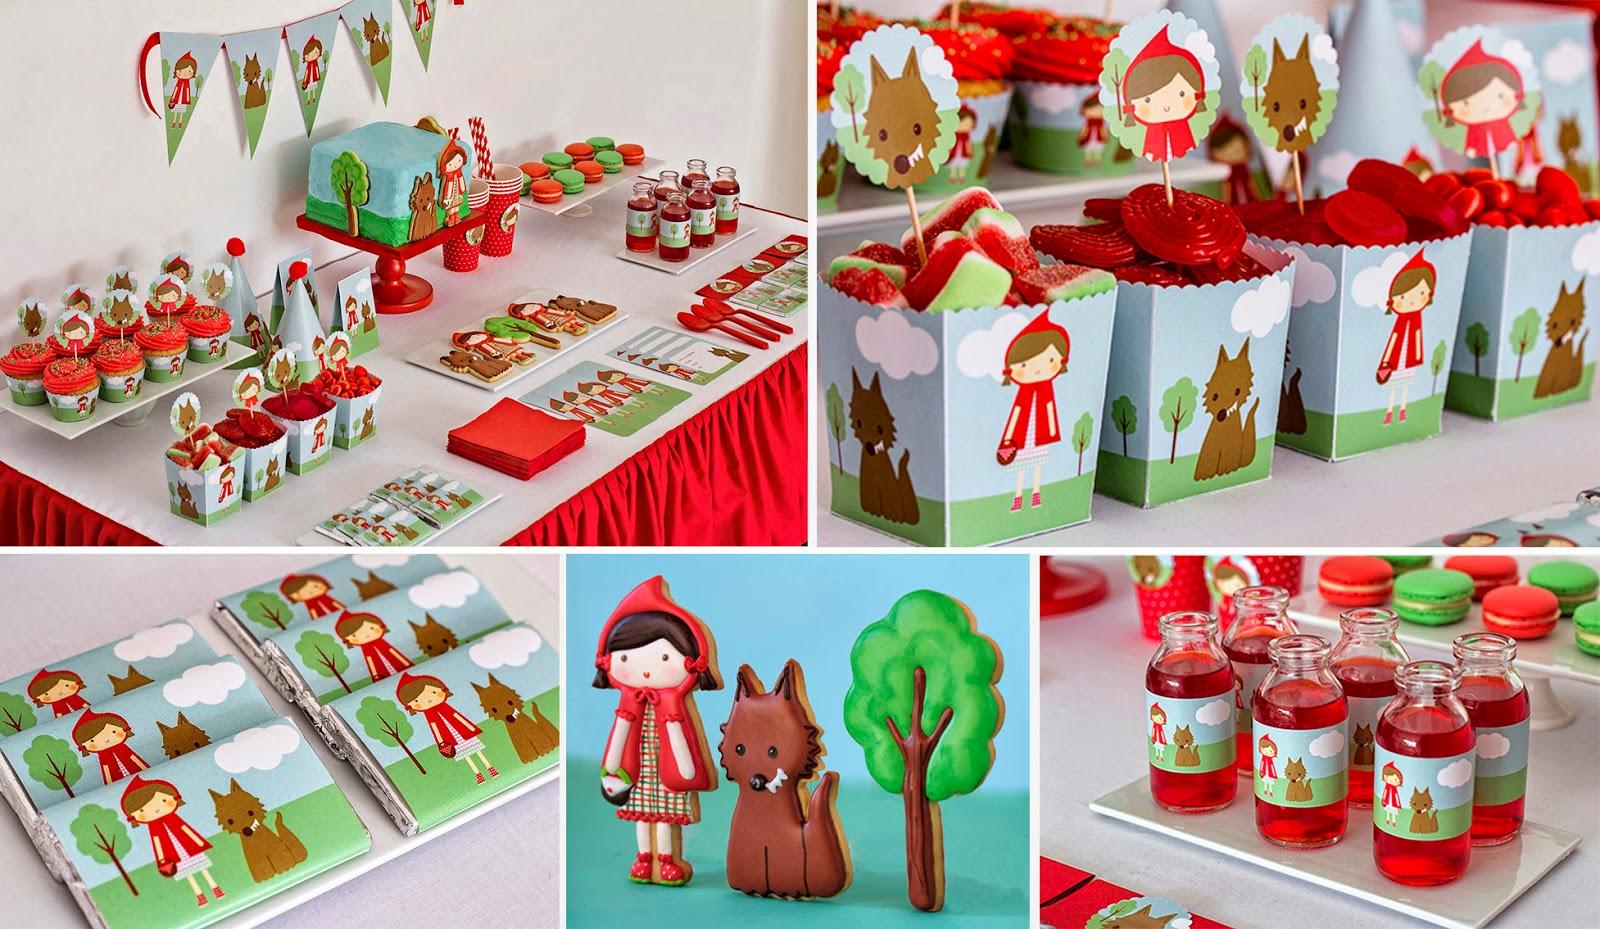 kit de fiesta cumpleaños caperucita roja